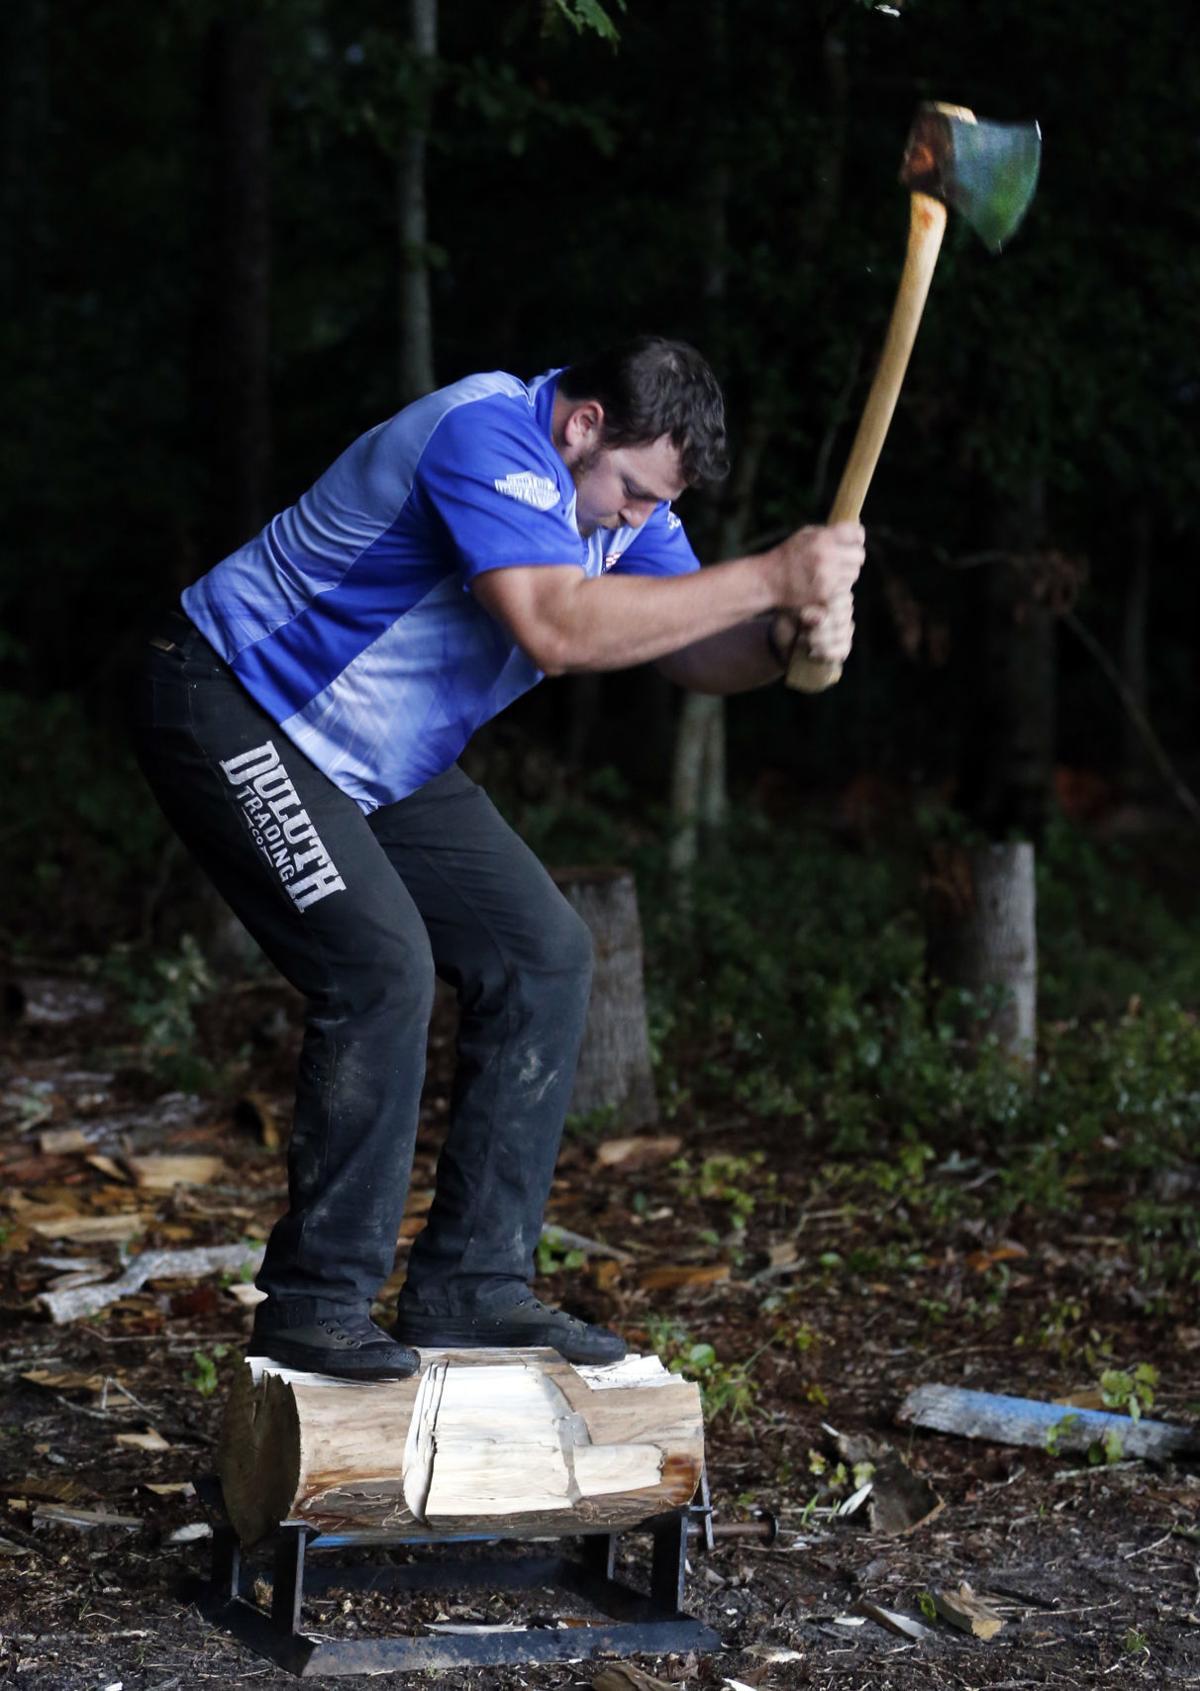 Andrew Sergent swings his axe